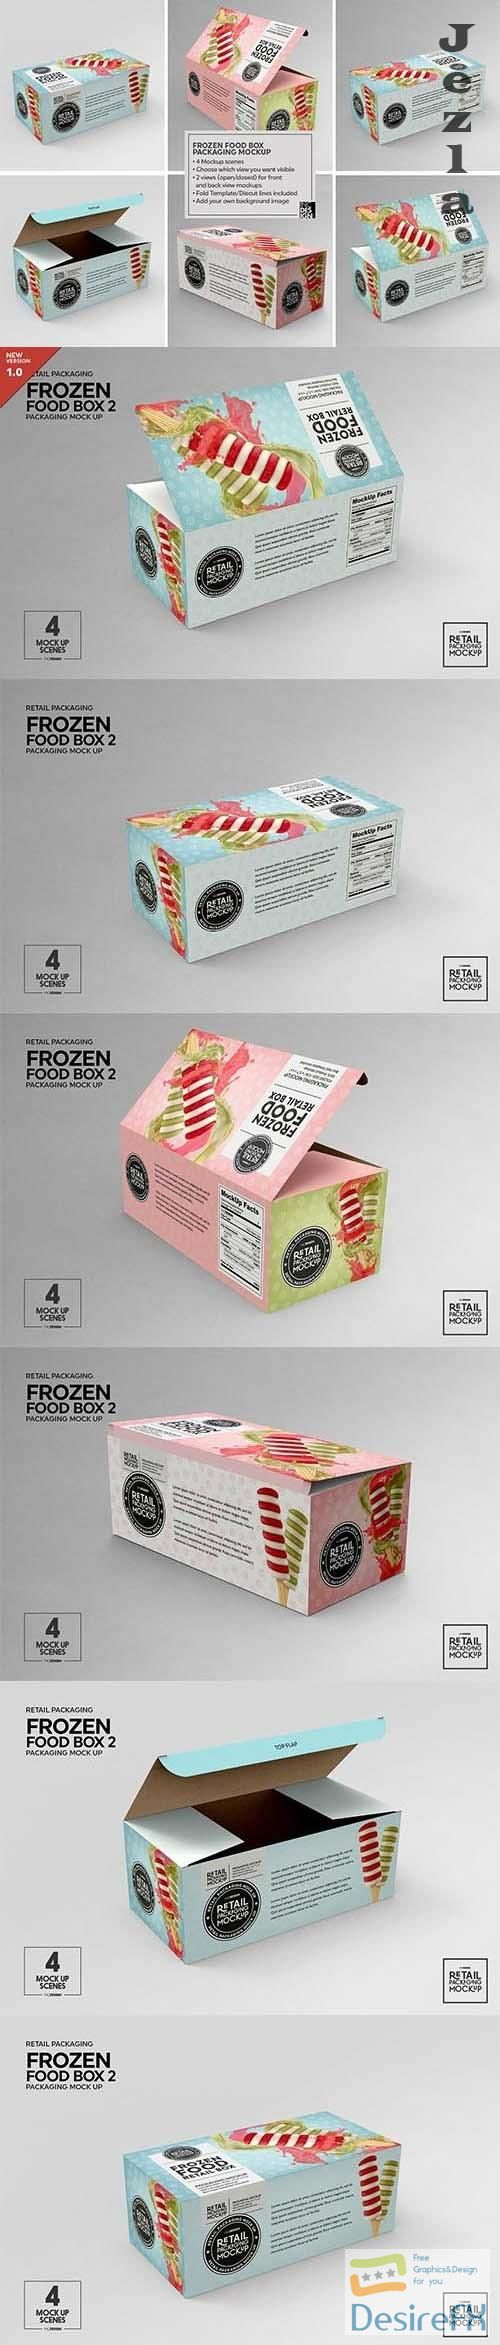 CreativeMarket - Retail Frozen Food Packaging2 Mockup 5730740